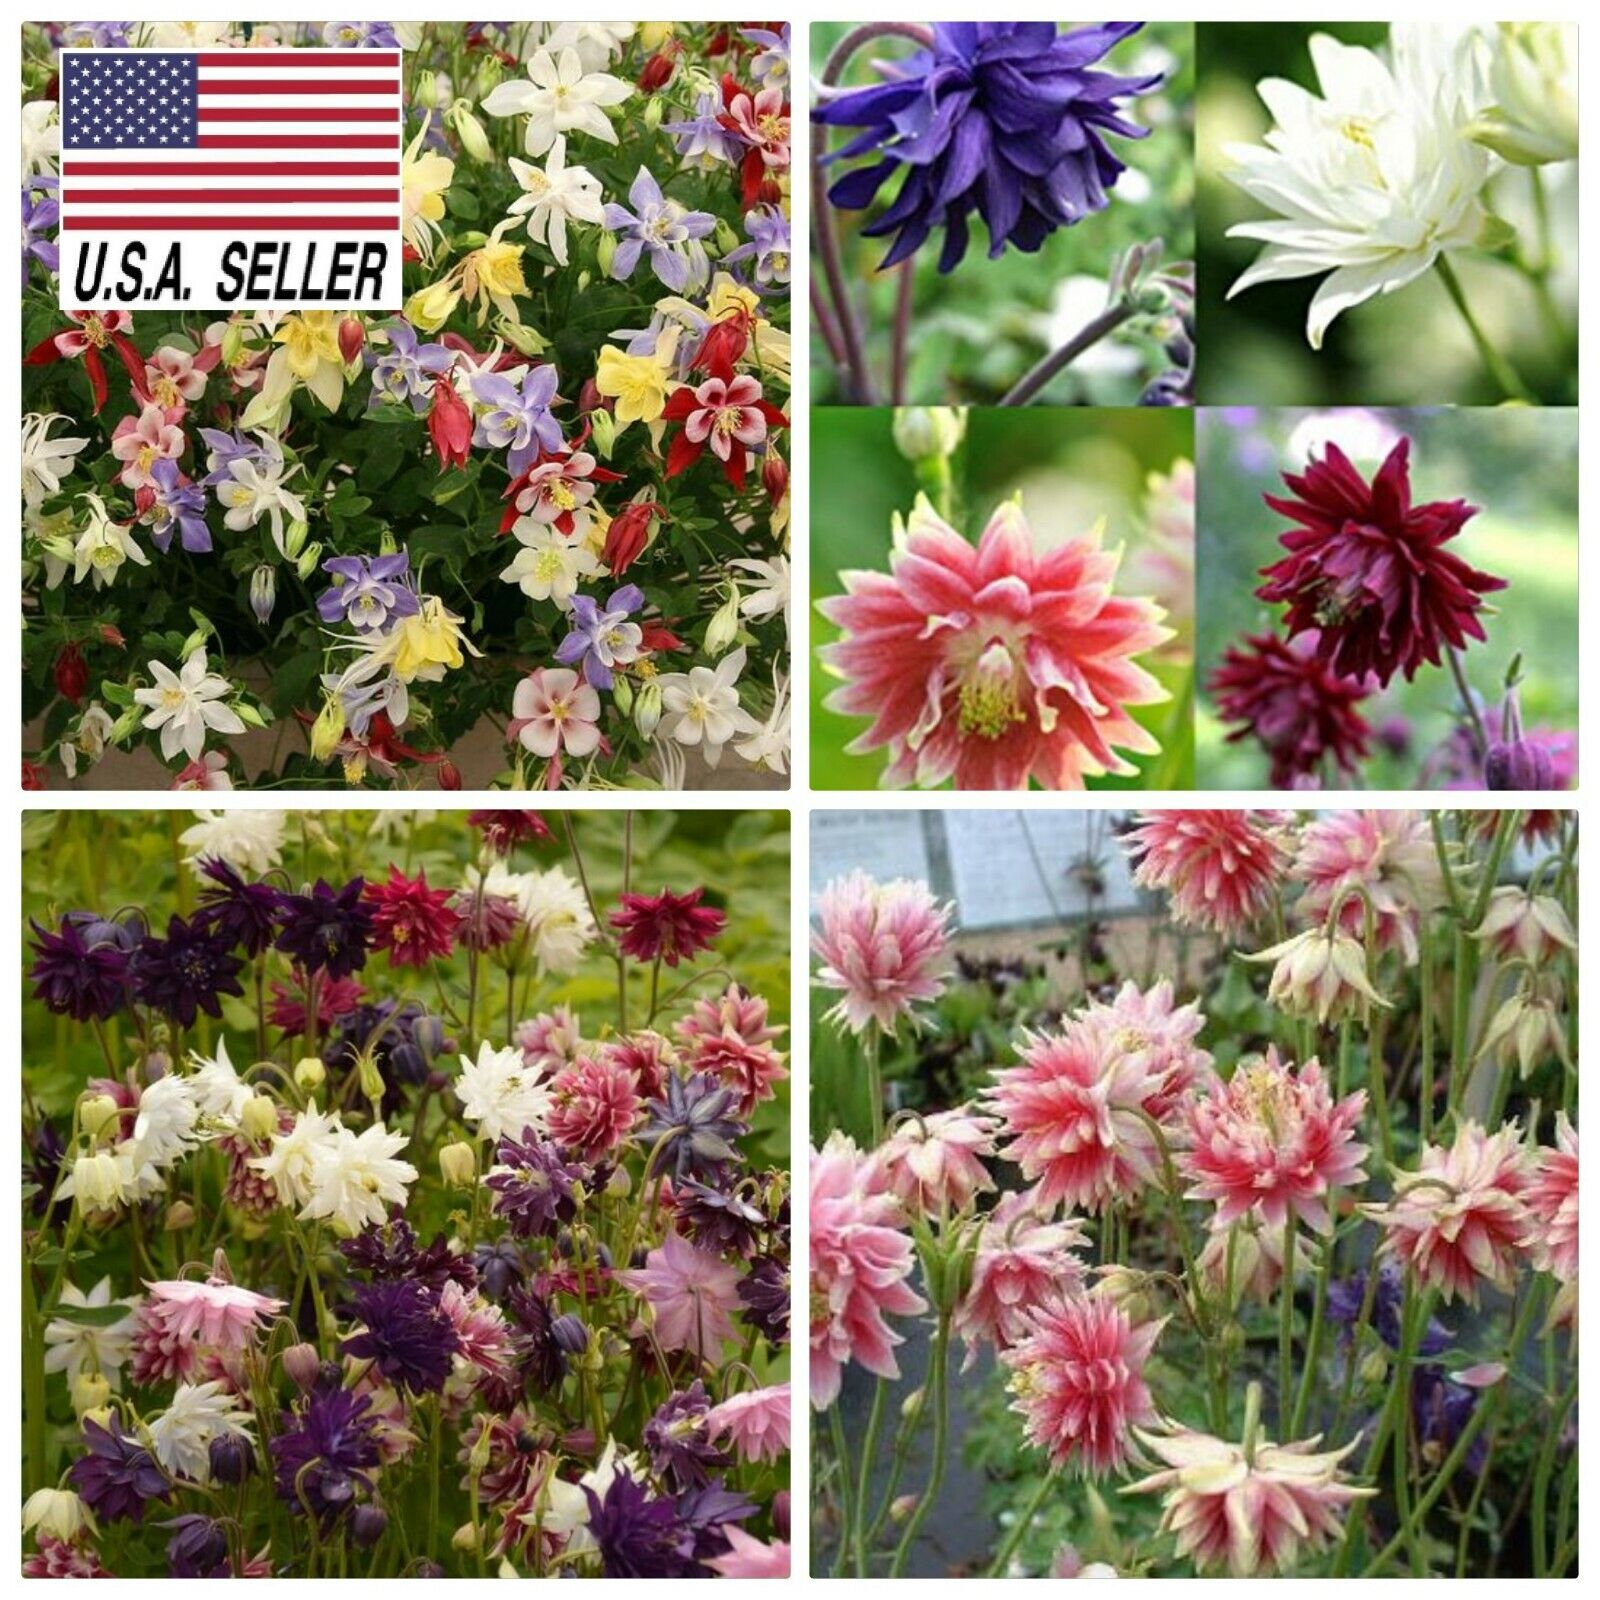 25 COLUMBINE AQUILEGIA GRANNYS LACE BONNETS FLOWER SEEDS PERENNIAL